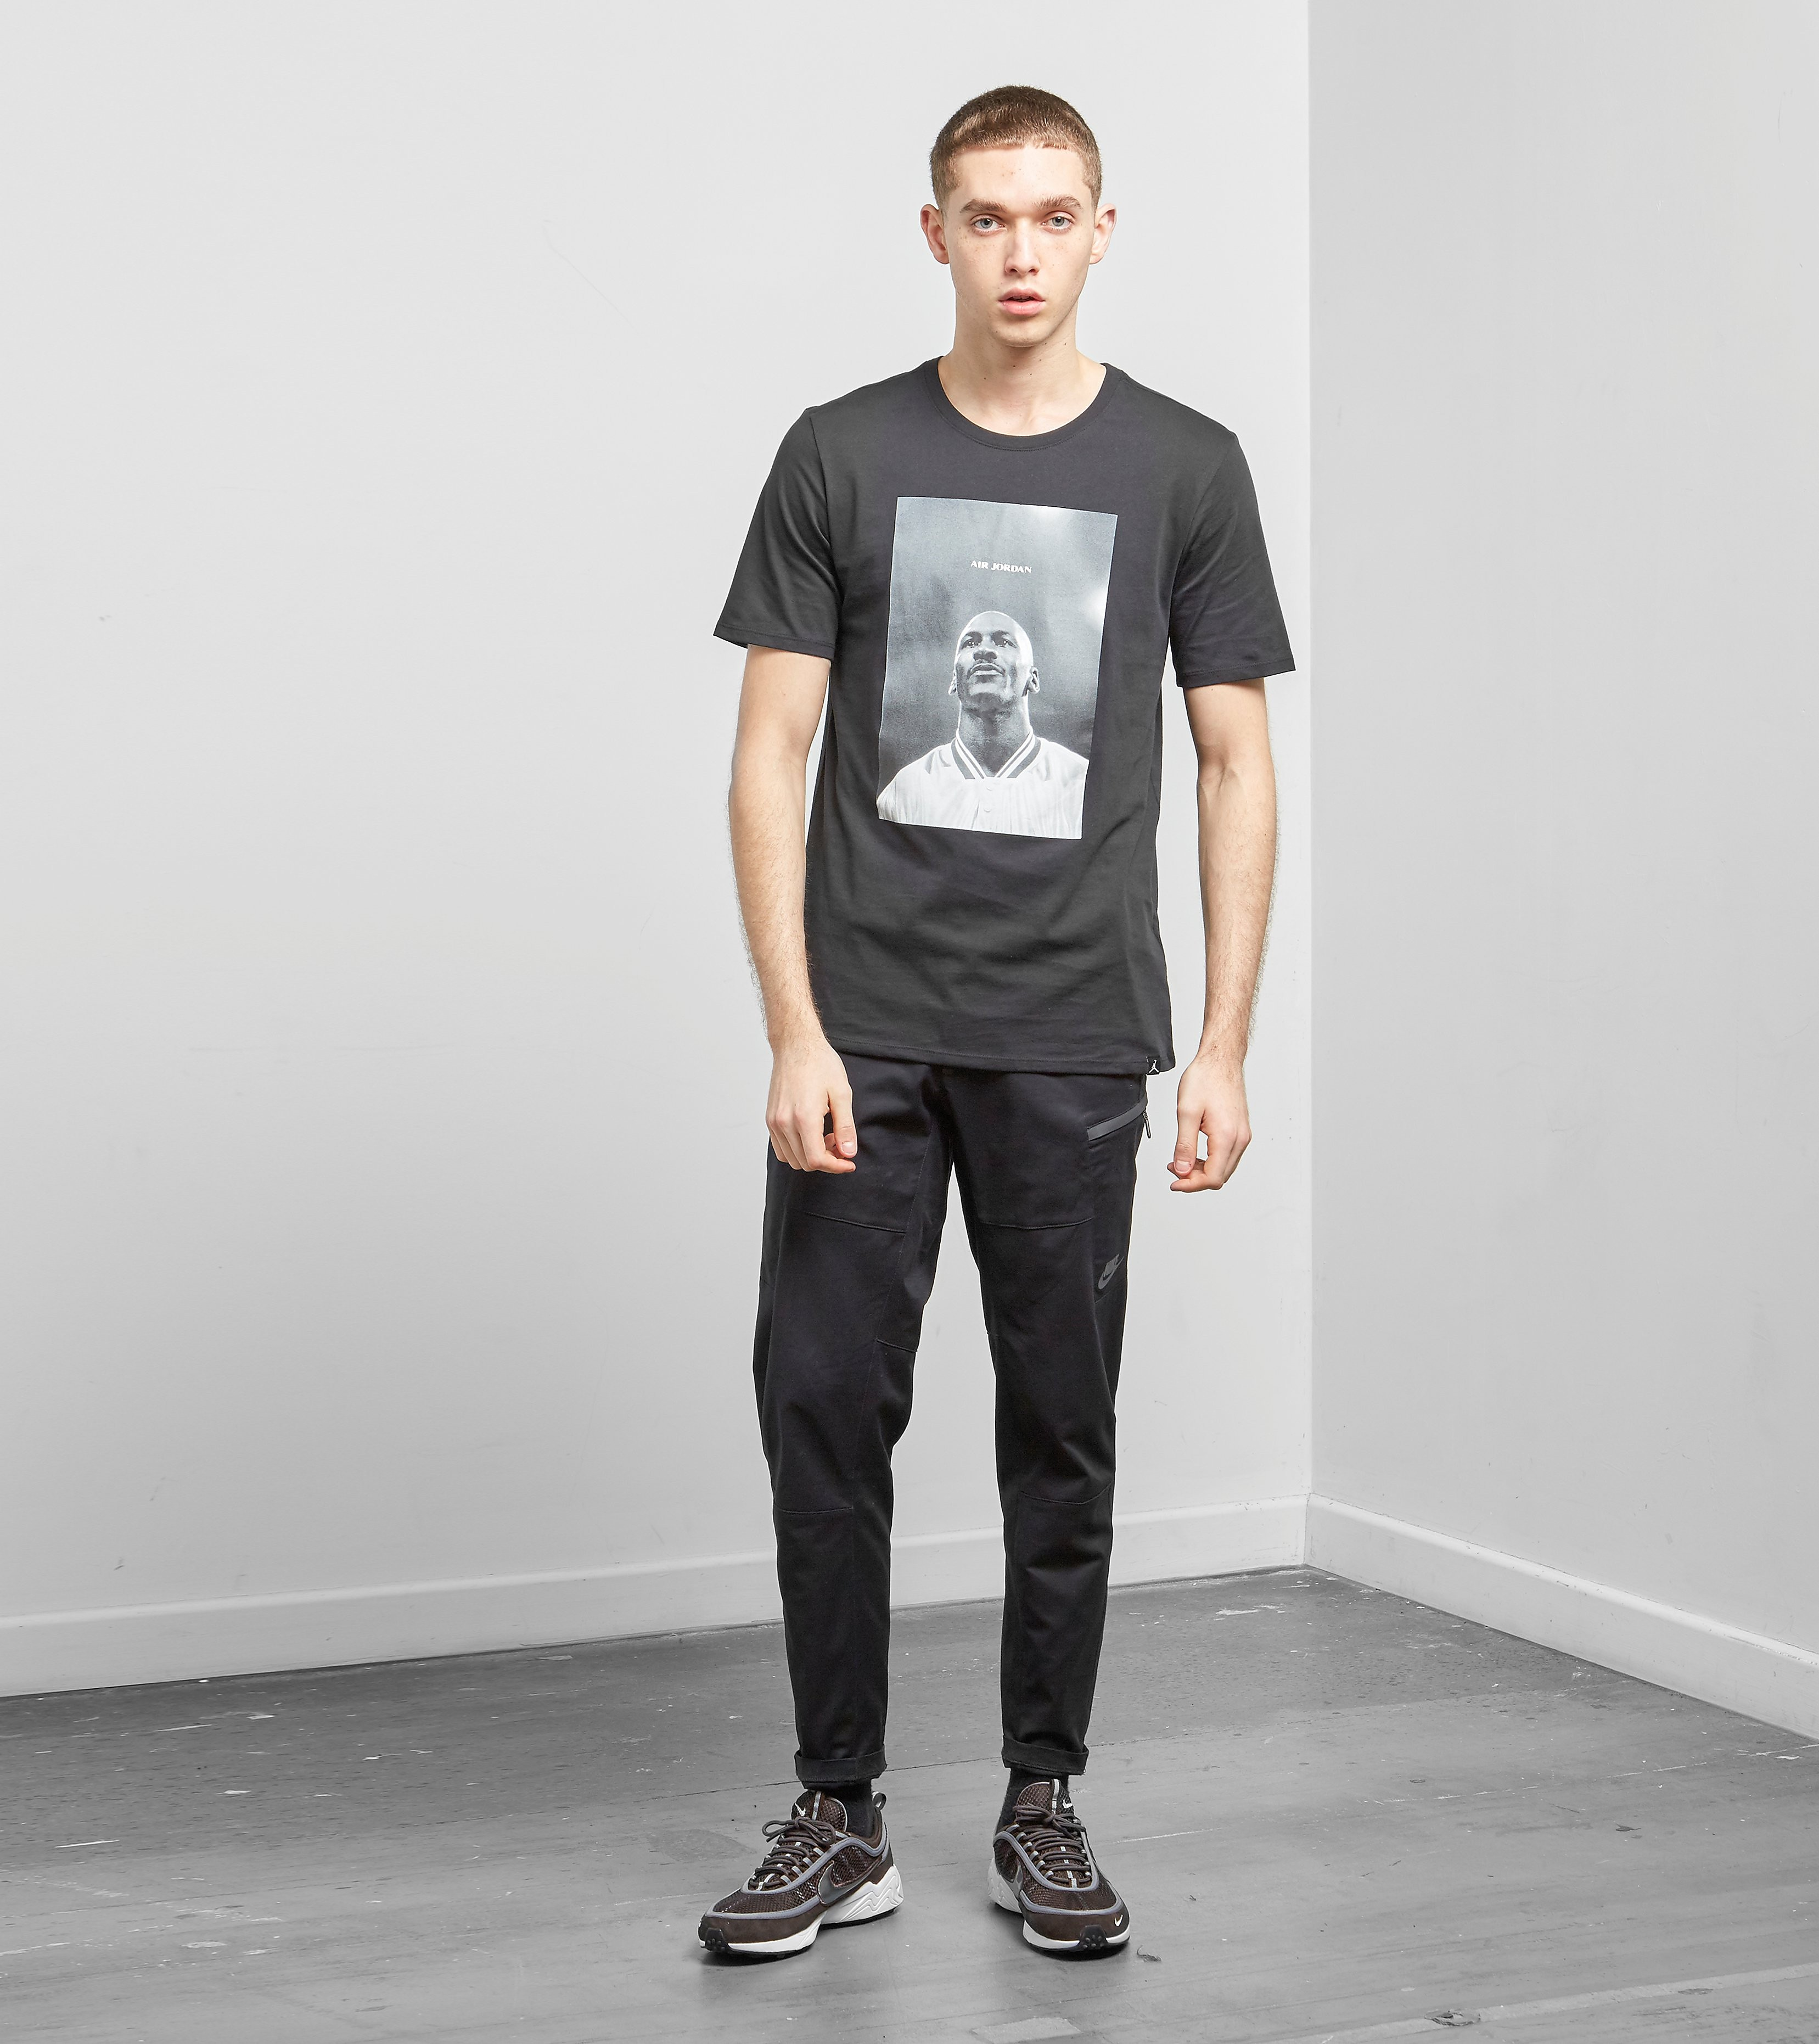 Jordan AJ Portrait T-shirt